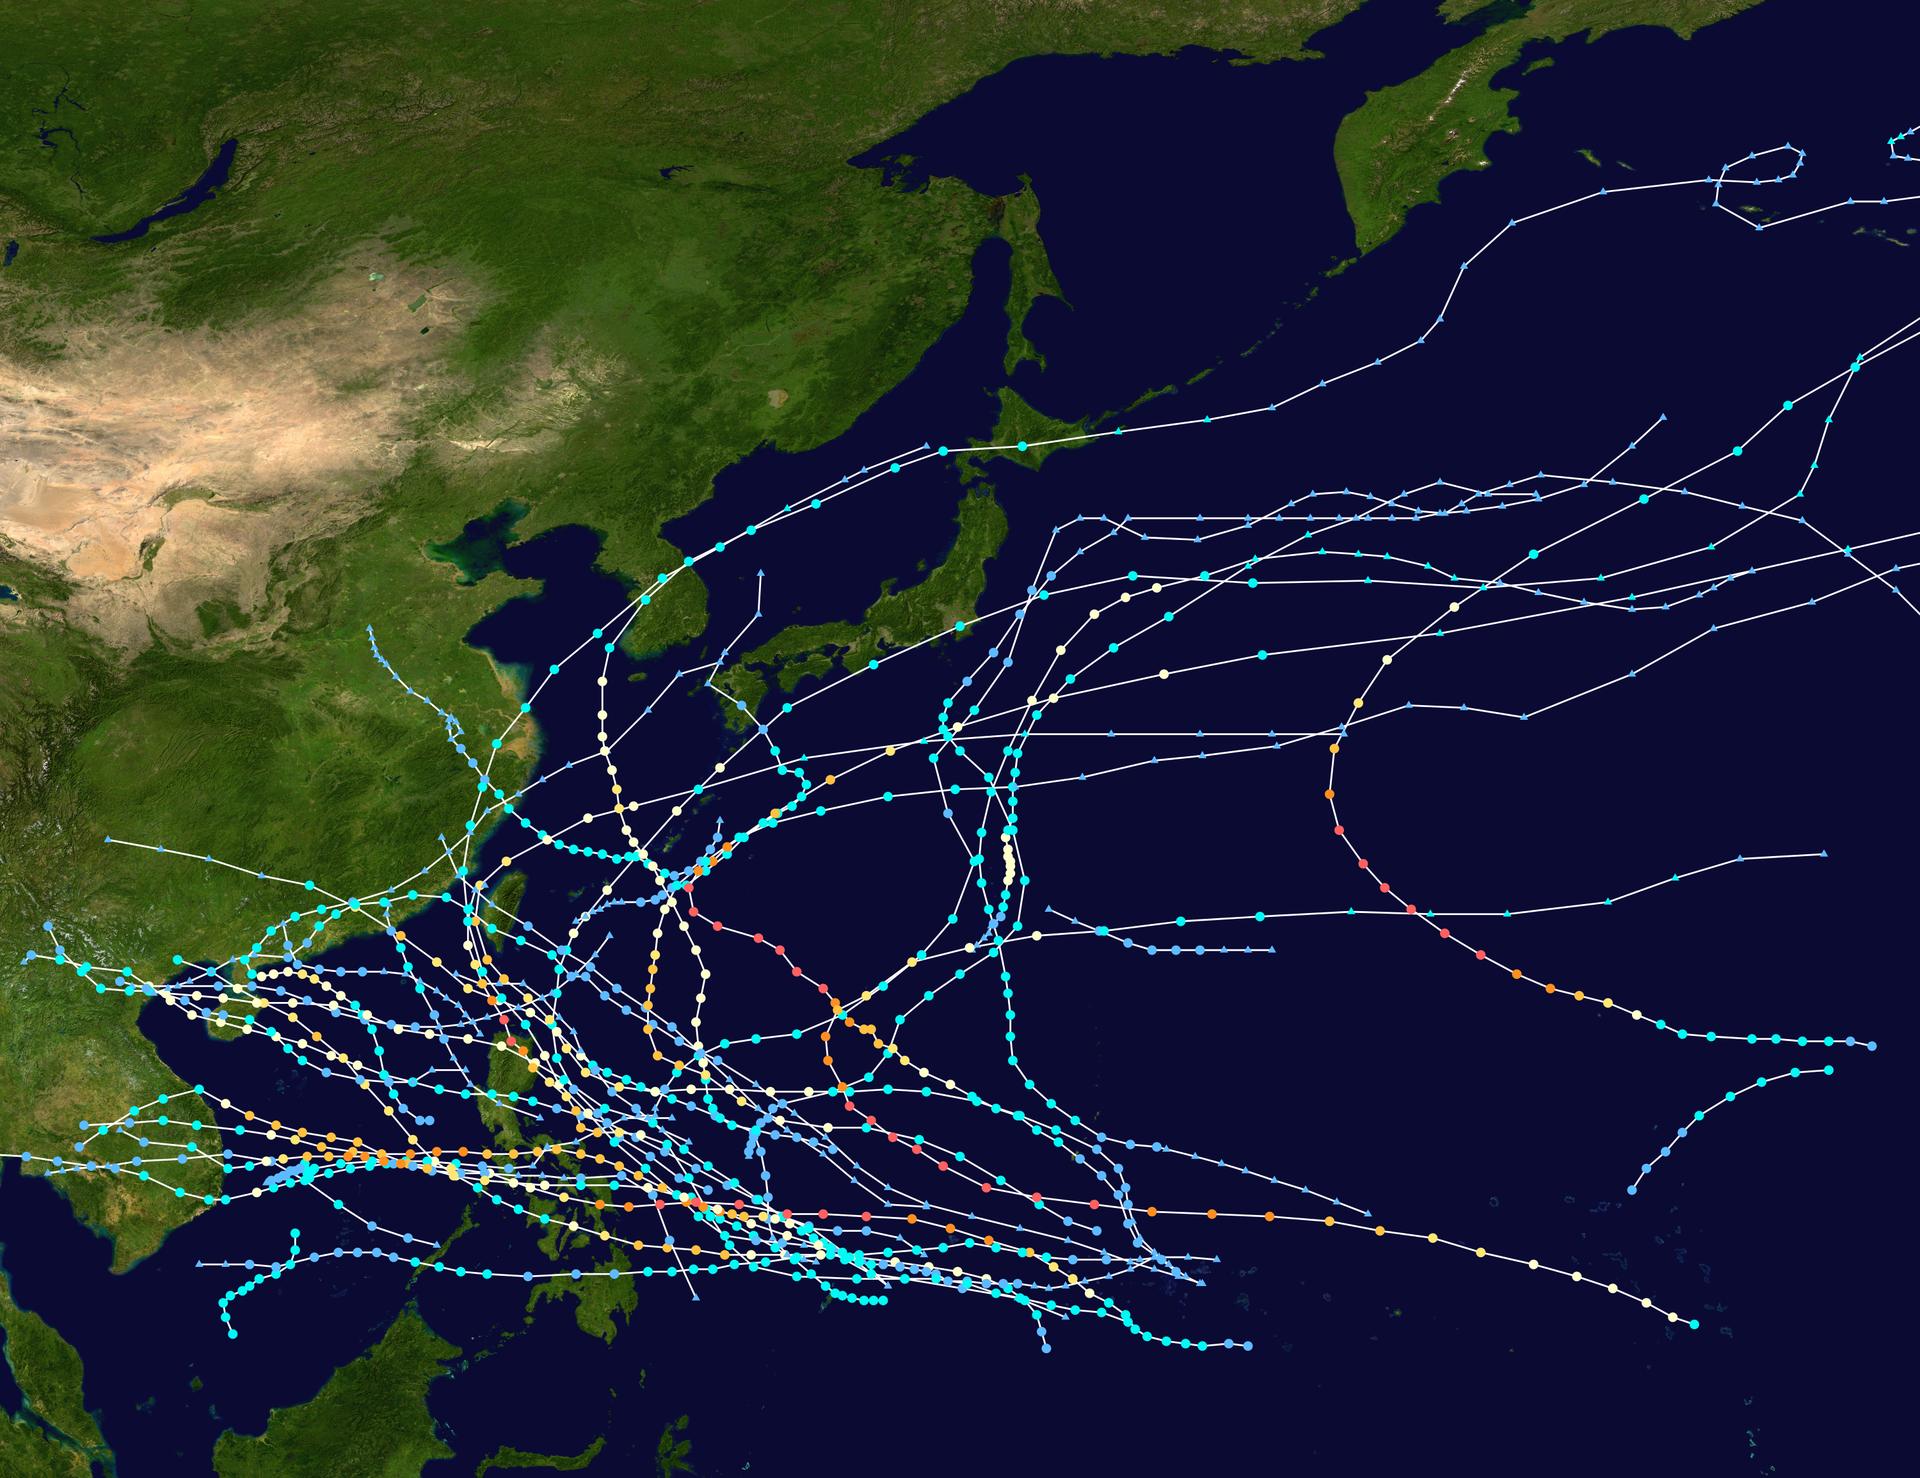 Typhoon Season In Japan - Japan Talk